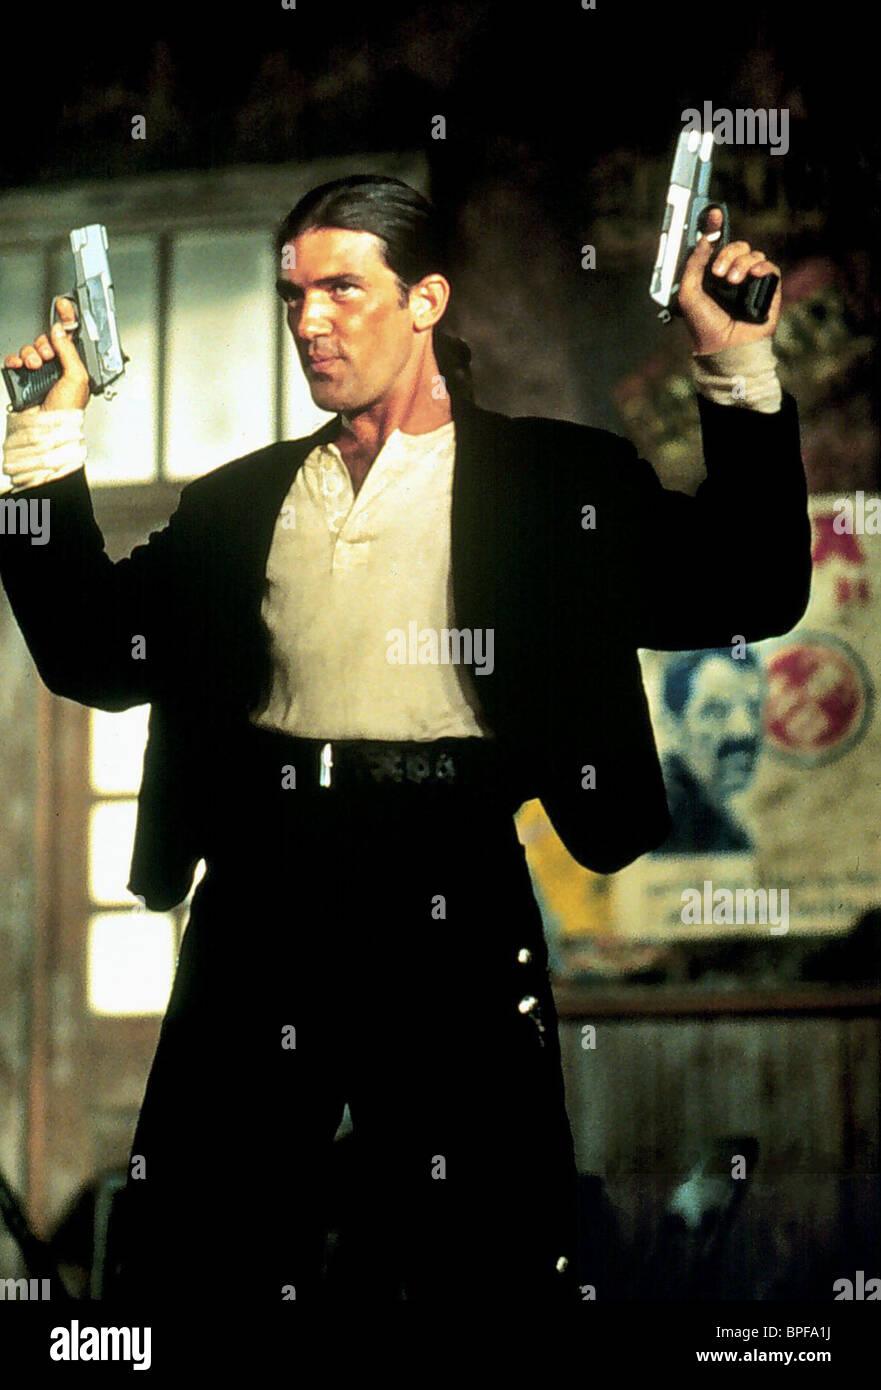 desperado 1995 full movie in english